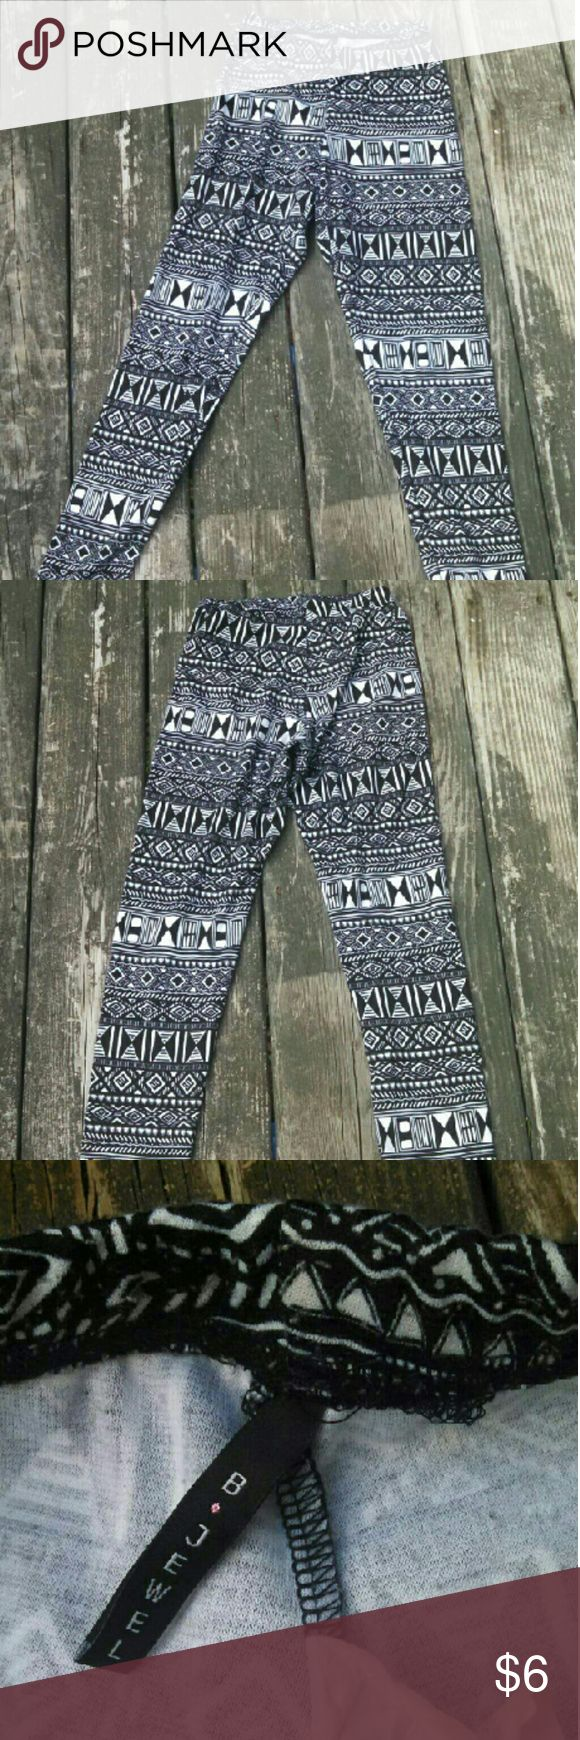 Tribal Print Leggings Tribal print leggings, Size small in great condition very comfortable. #tribal  #tribalprint #blackandwhite #black #white #legging #leggings #forever21 #bjewel b.jewel Pants Leggings